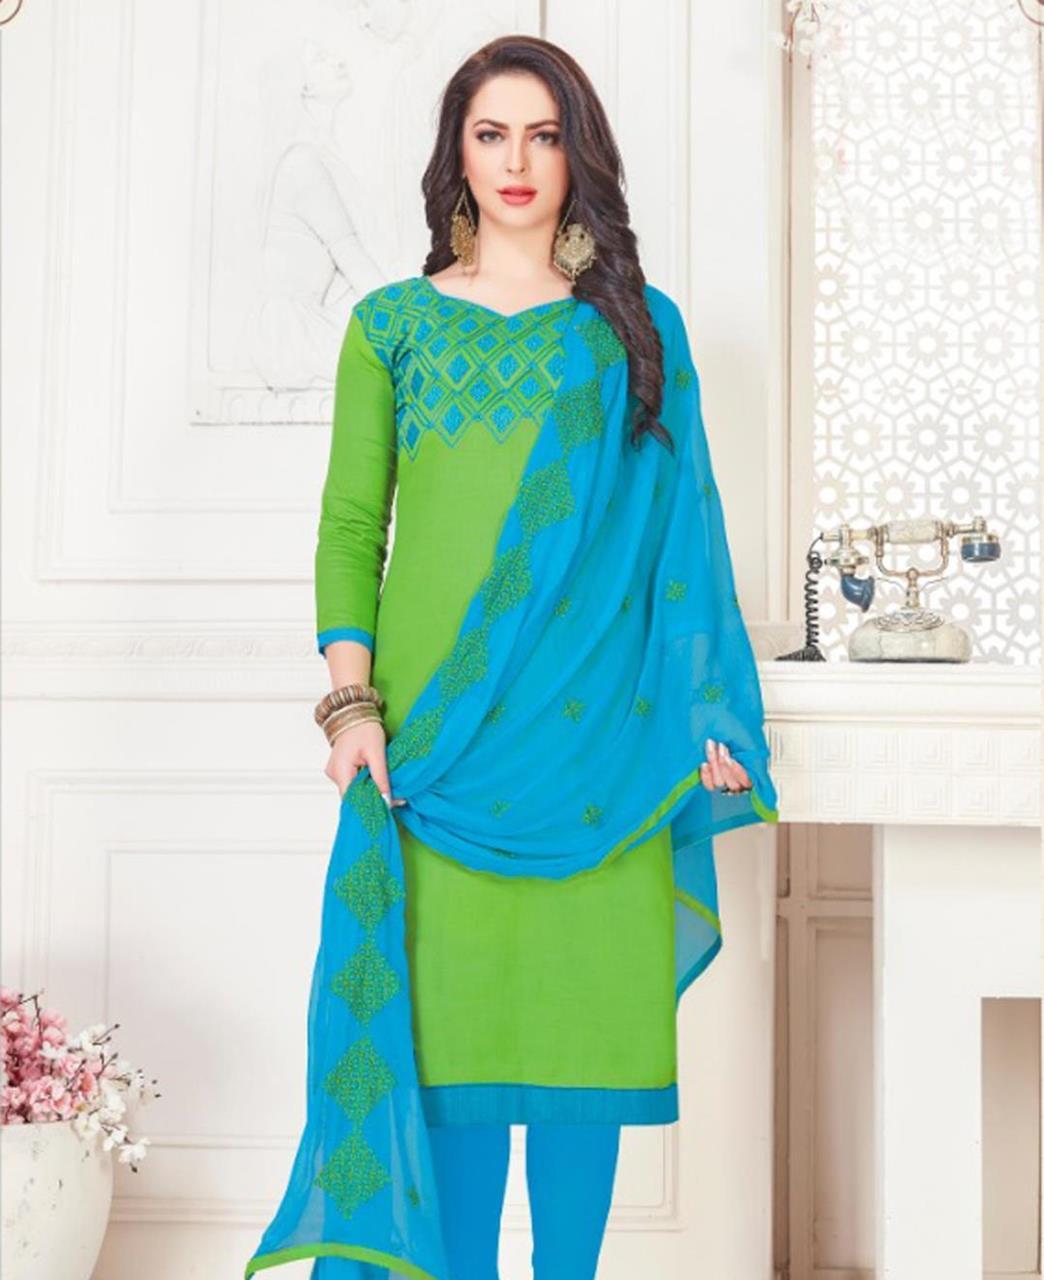 Embroidered Cotton Satin Green Straight Cut Salwar Kameez